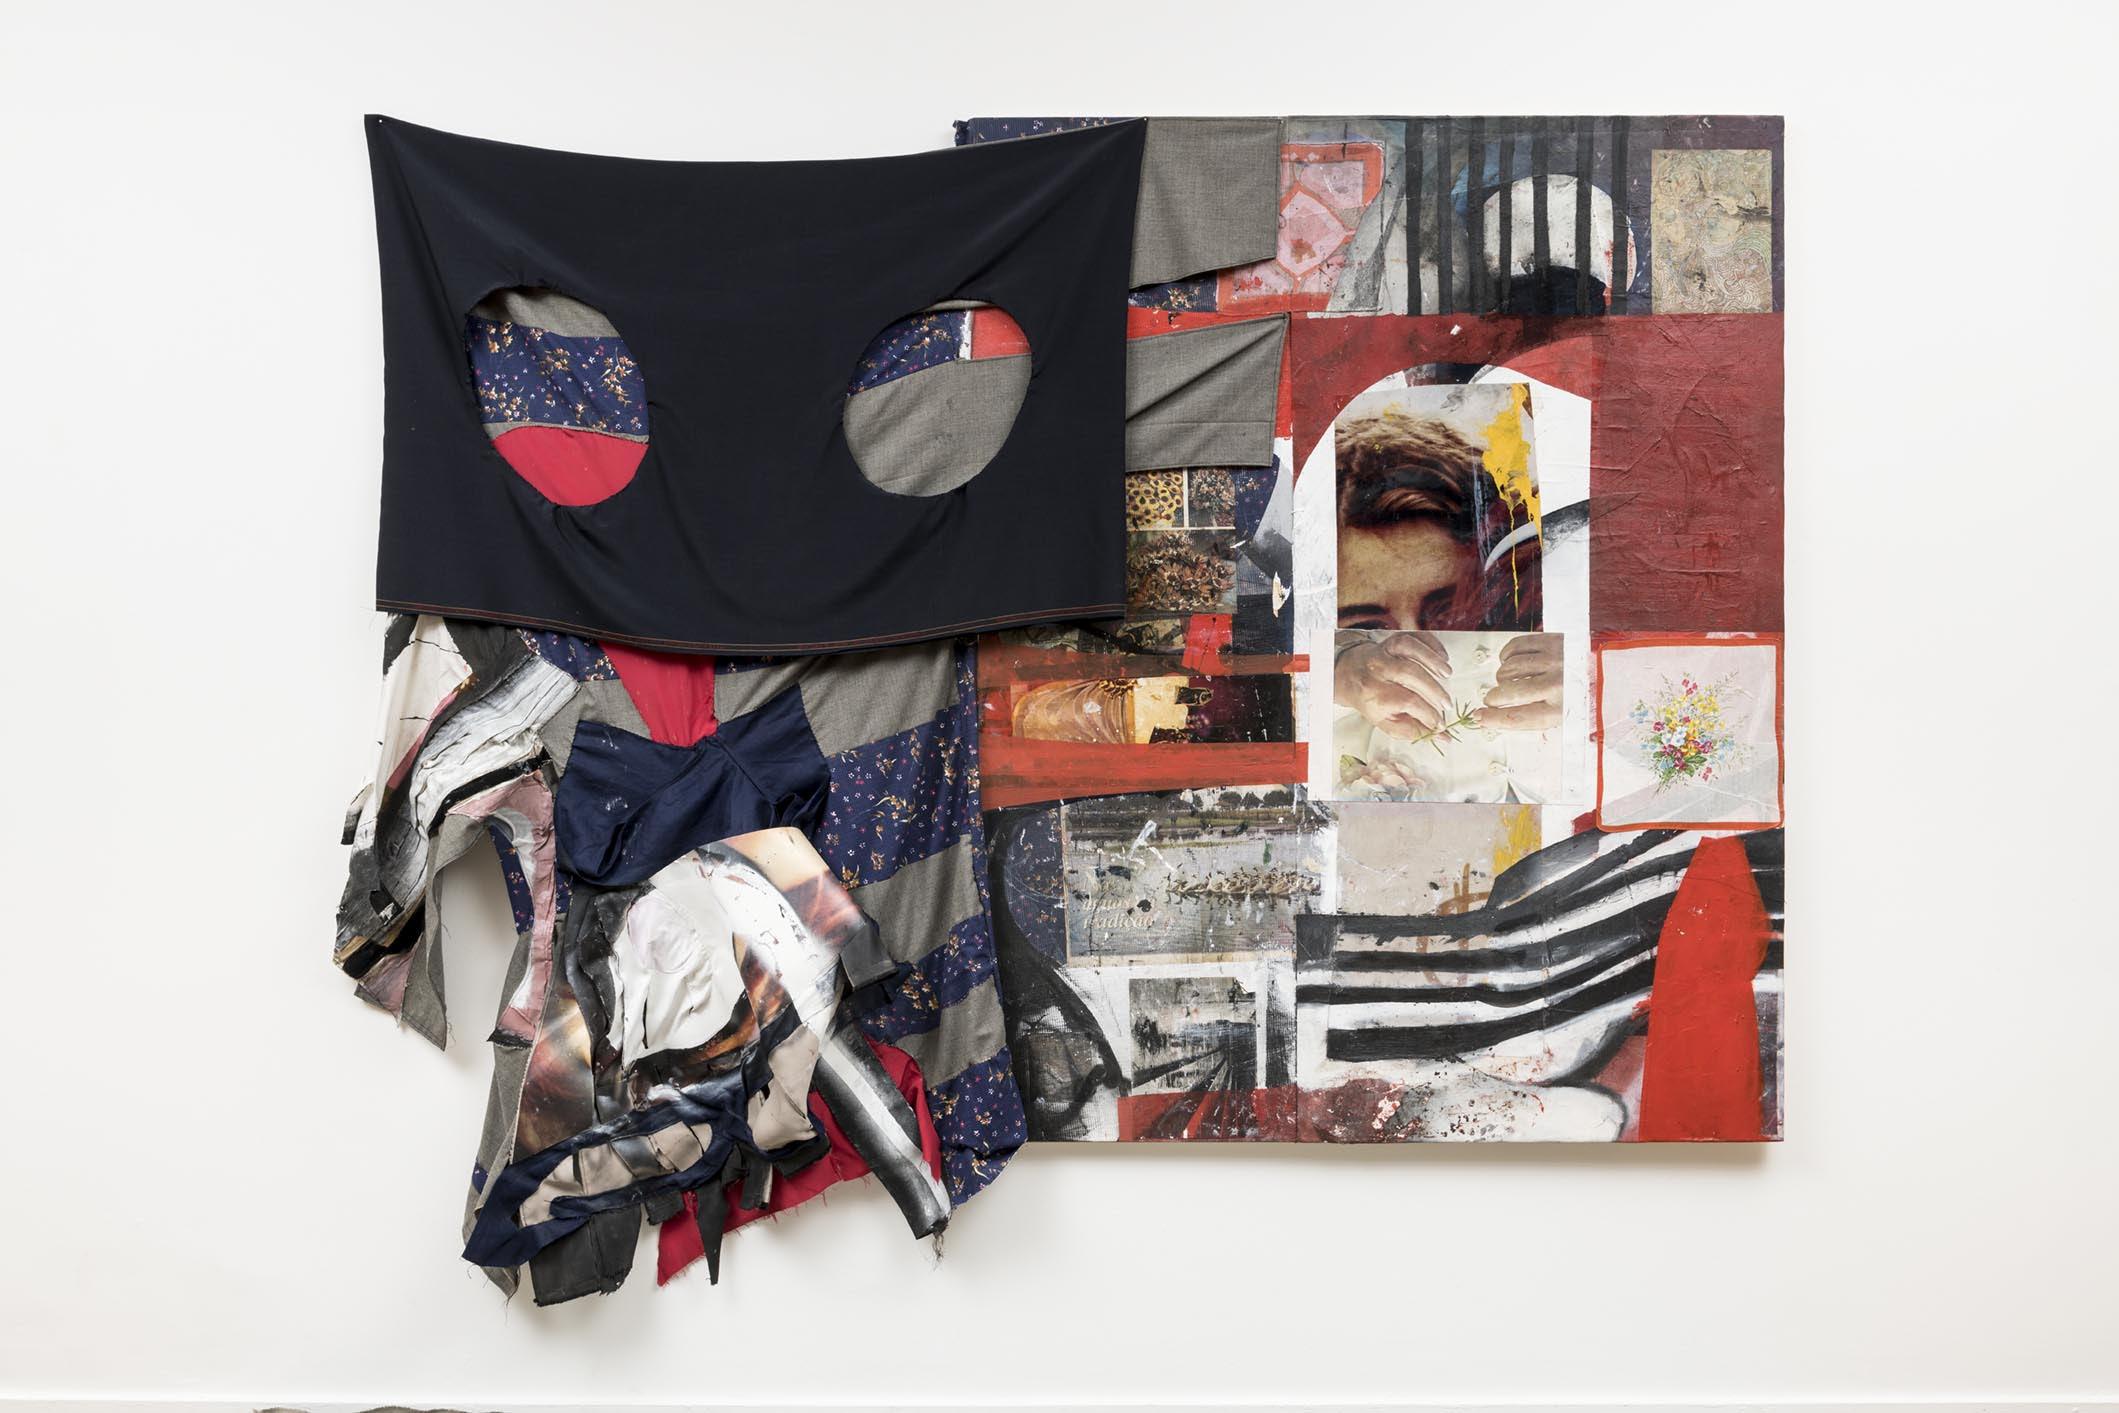 Arthur Chaves, Sem título [Untitled],  2017/2018, técnica mista [m ixed media ] aprox. 155,5 x 213 cm